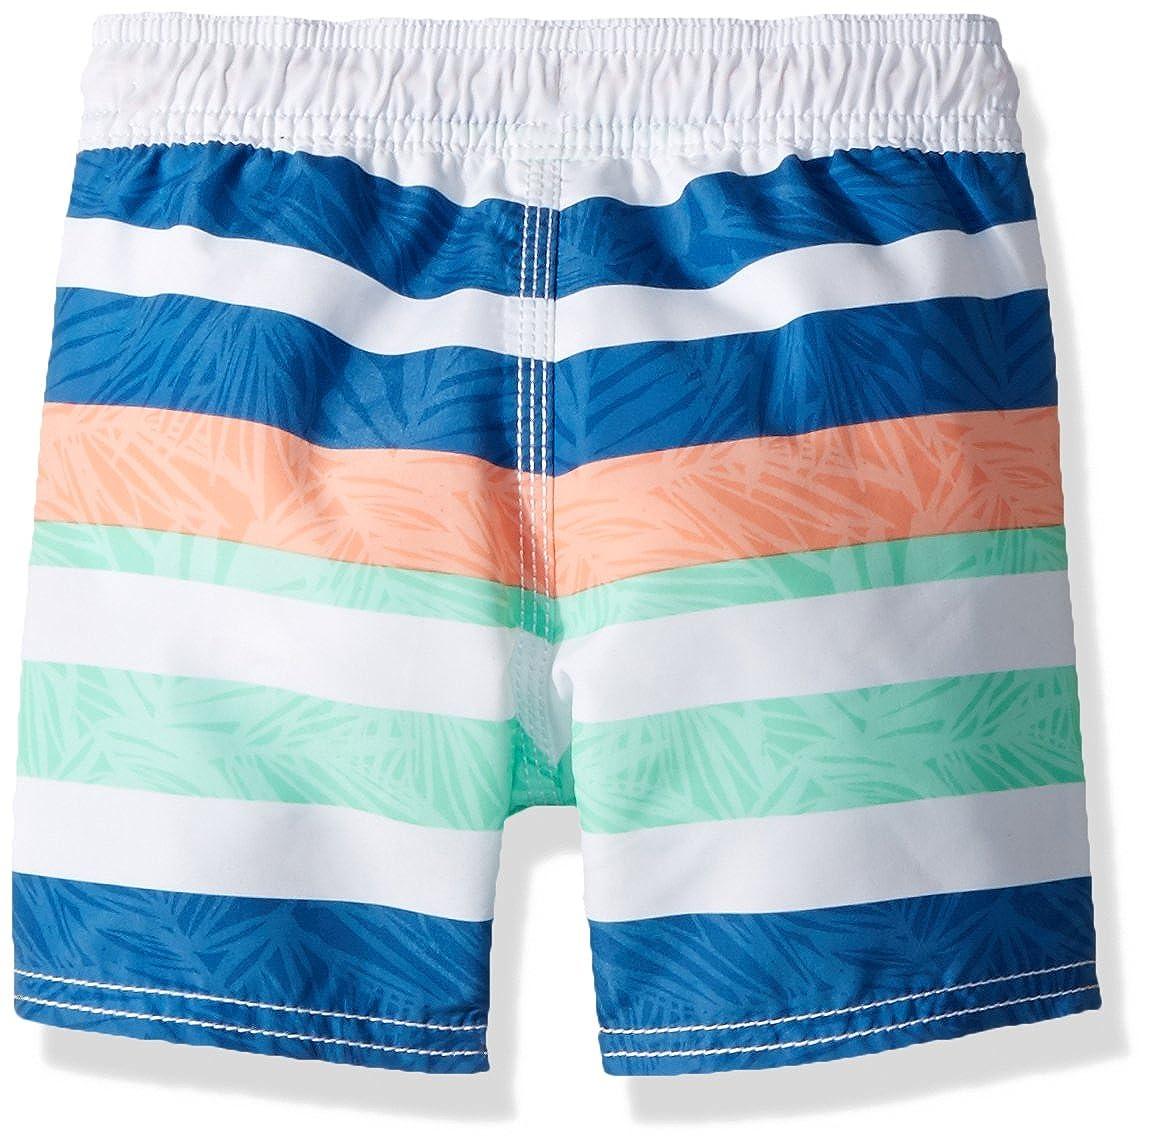 OshKosh BGosh Boys Kids Swim Trunks Multiple Varieties Black//Yellow Shark 7 Osh Kosh 43512010